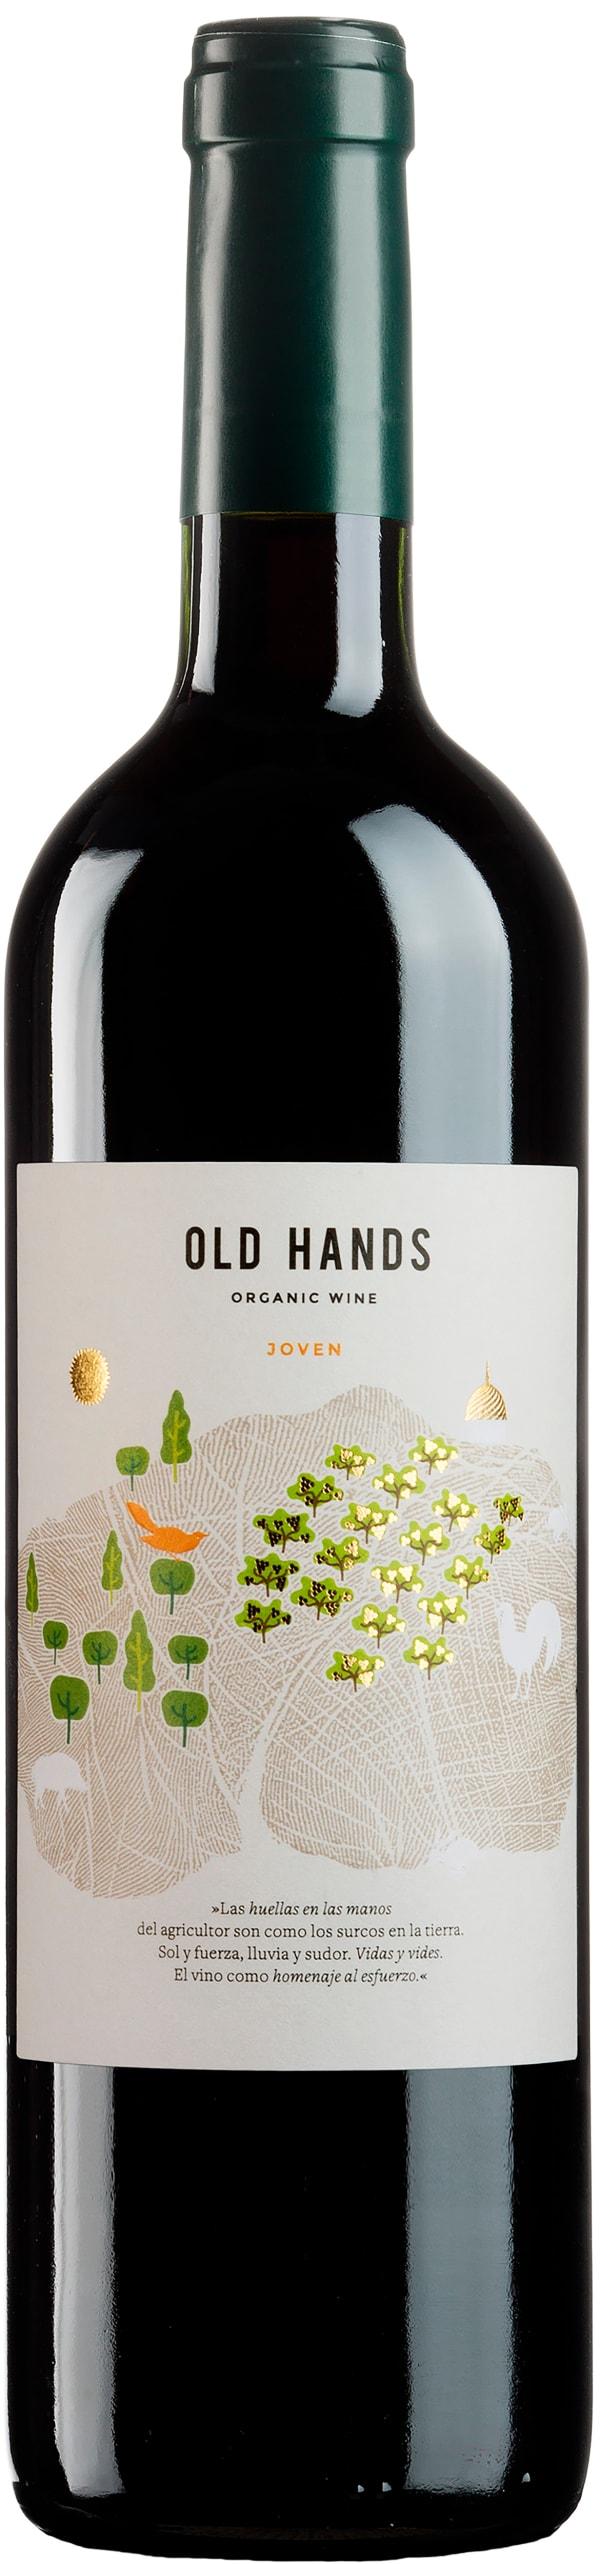 La Purisima Old Hands Joven 2017